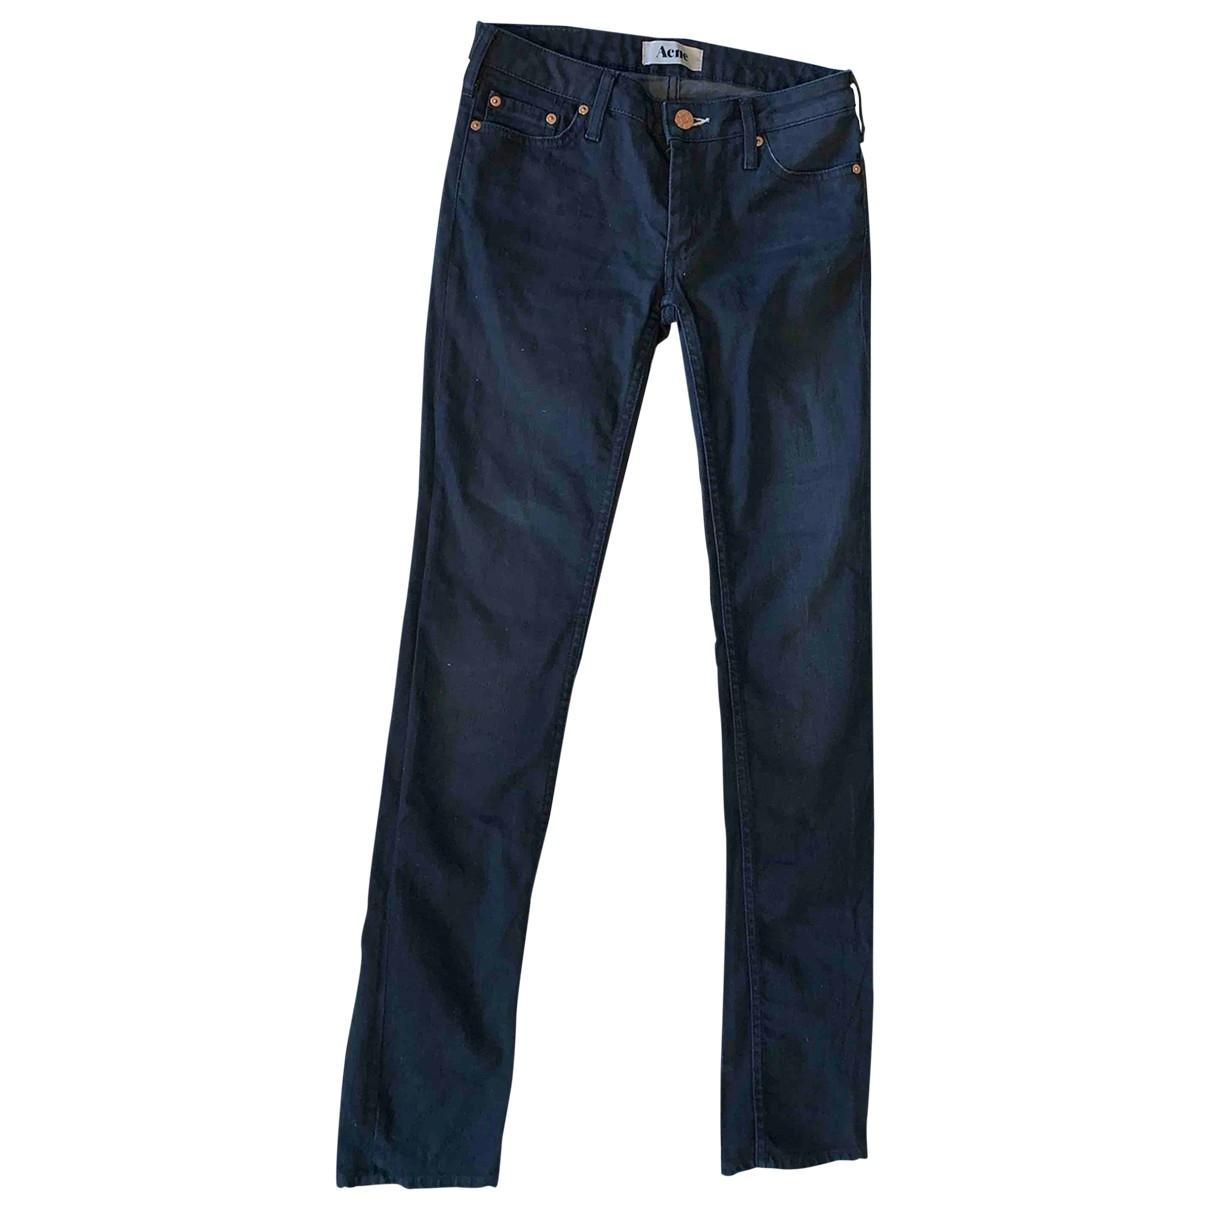 Acne Studios Skin 5 Blue Denim - Jeans Jeans for Women 36 FR